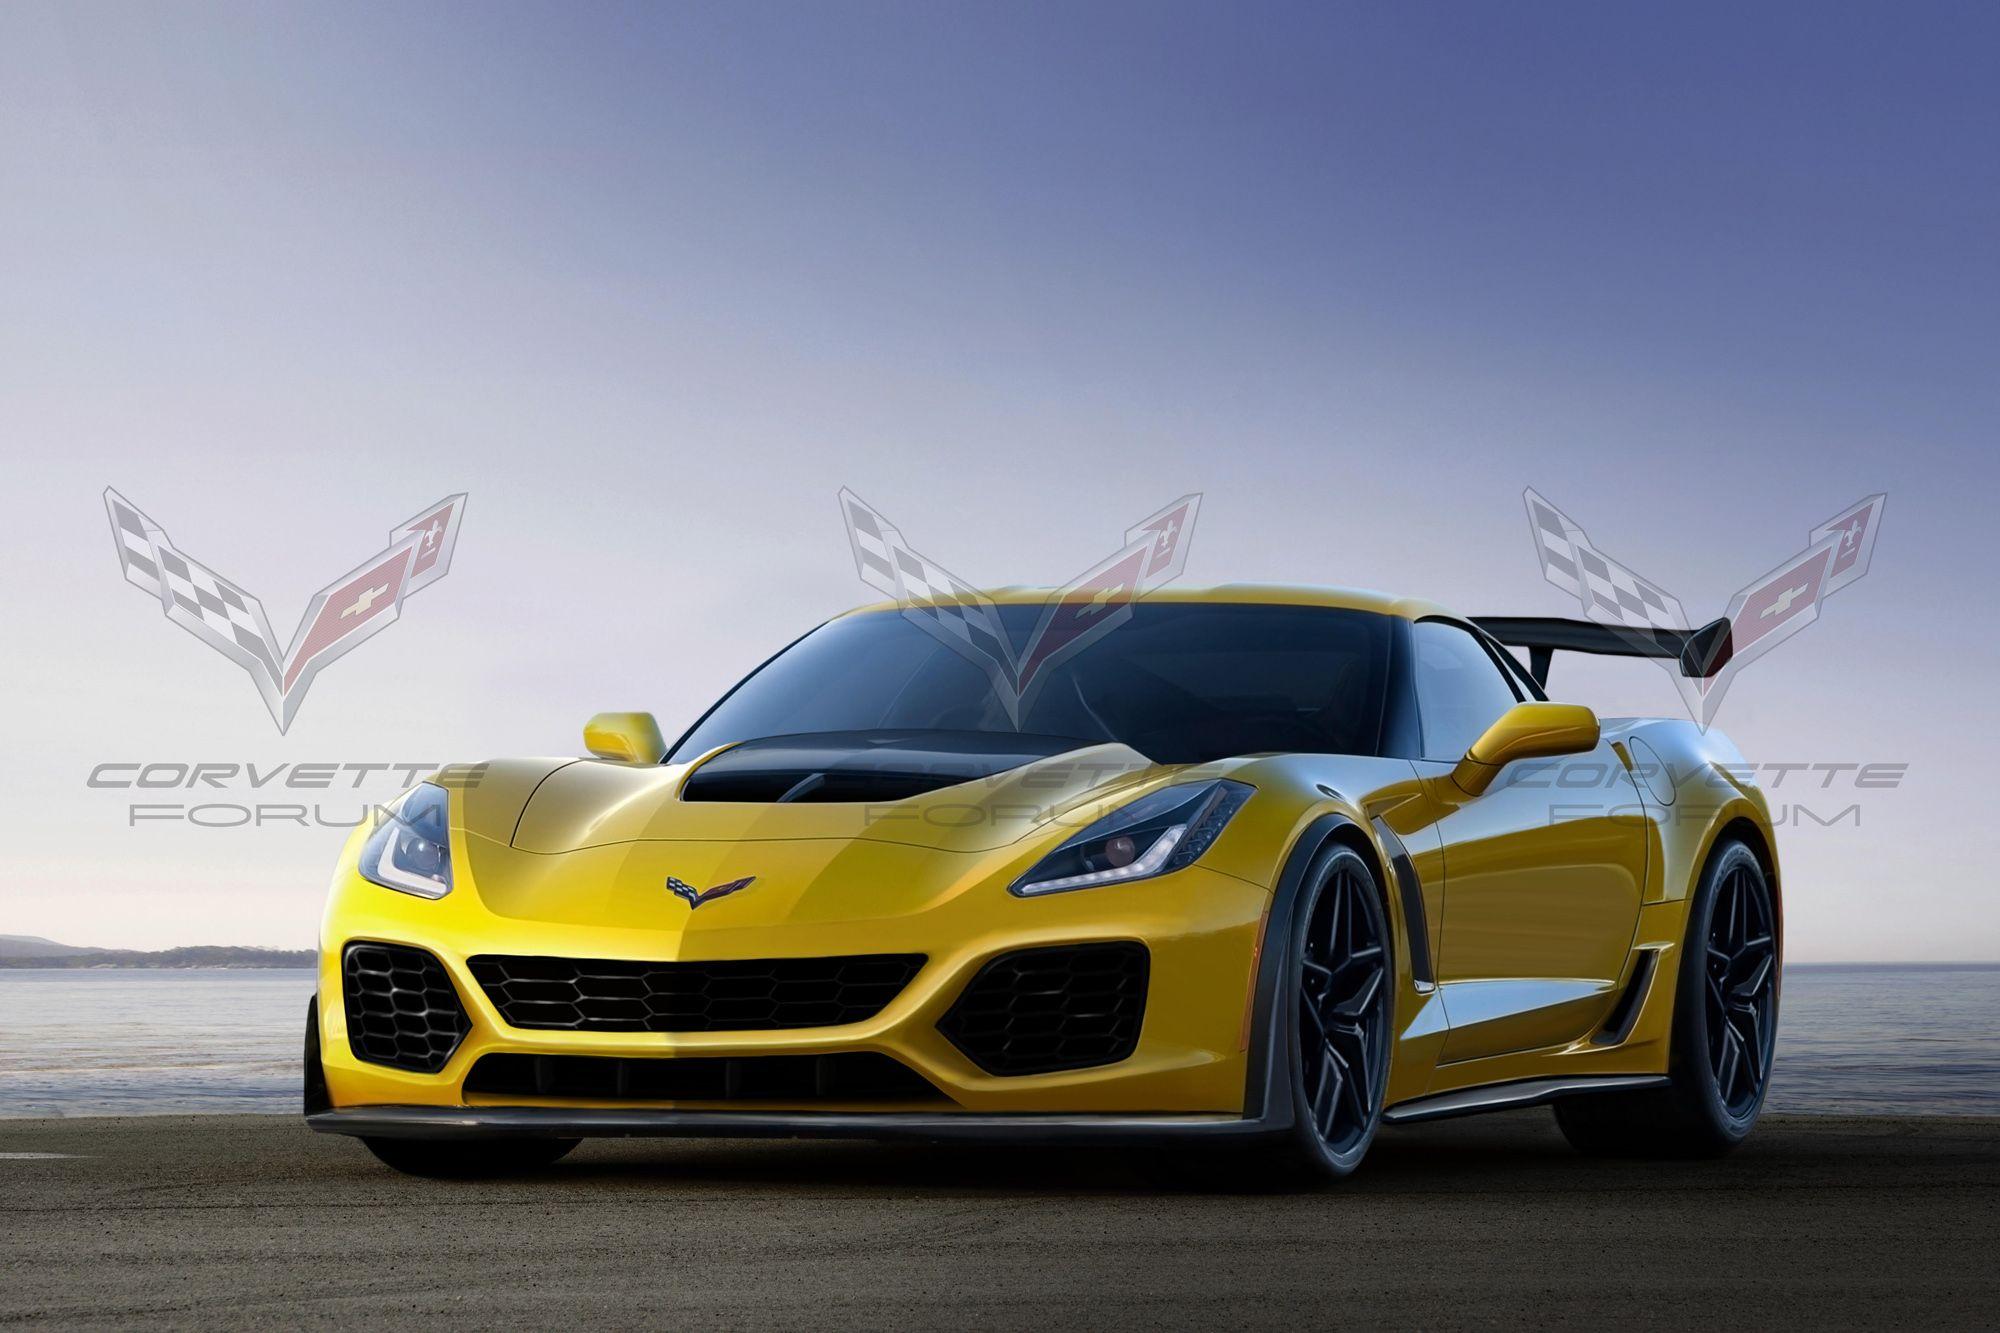 New Corvette ZR1 Could Be Baddest Ever | My cars | Pinterest ...